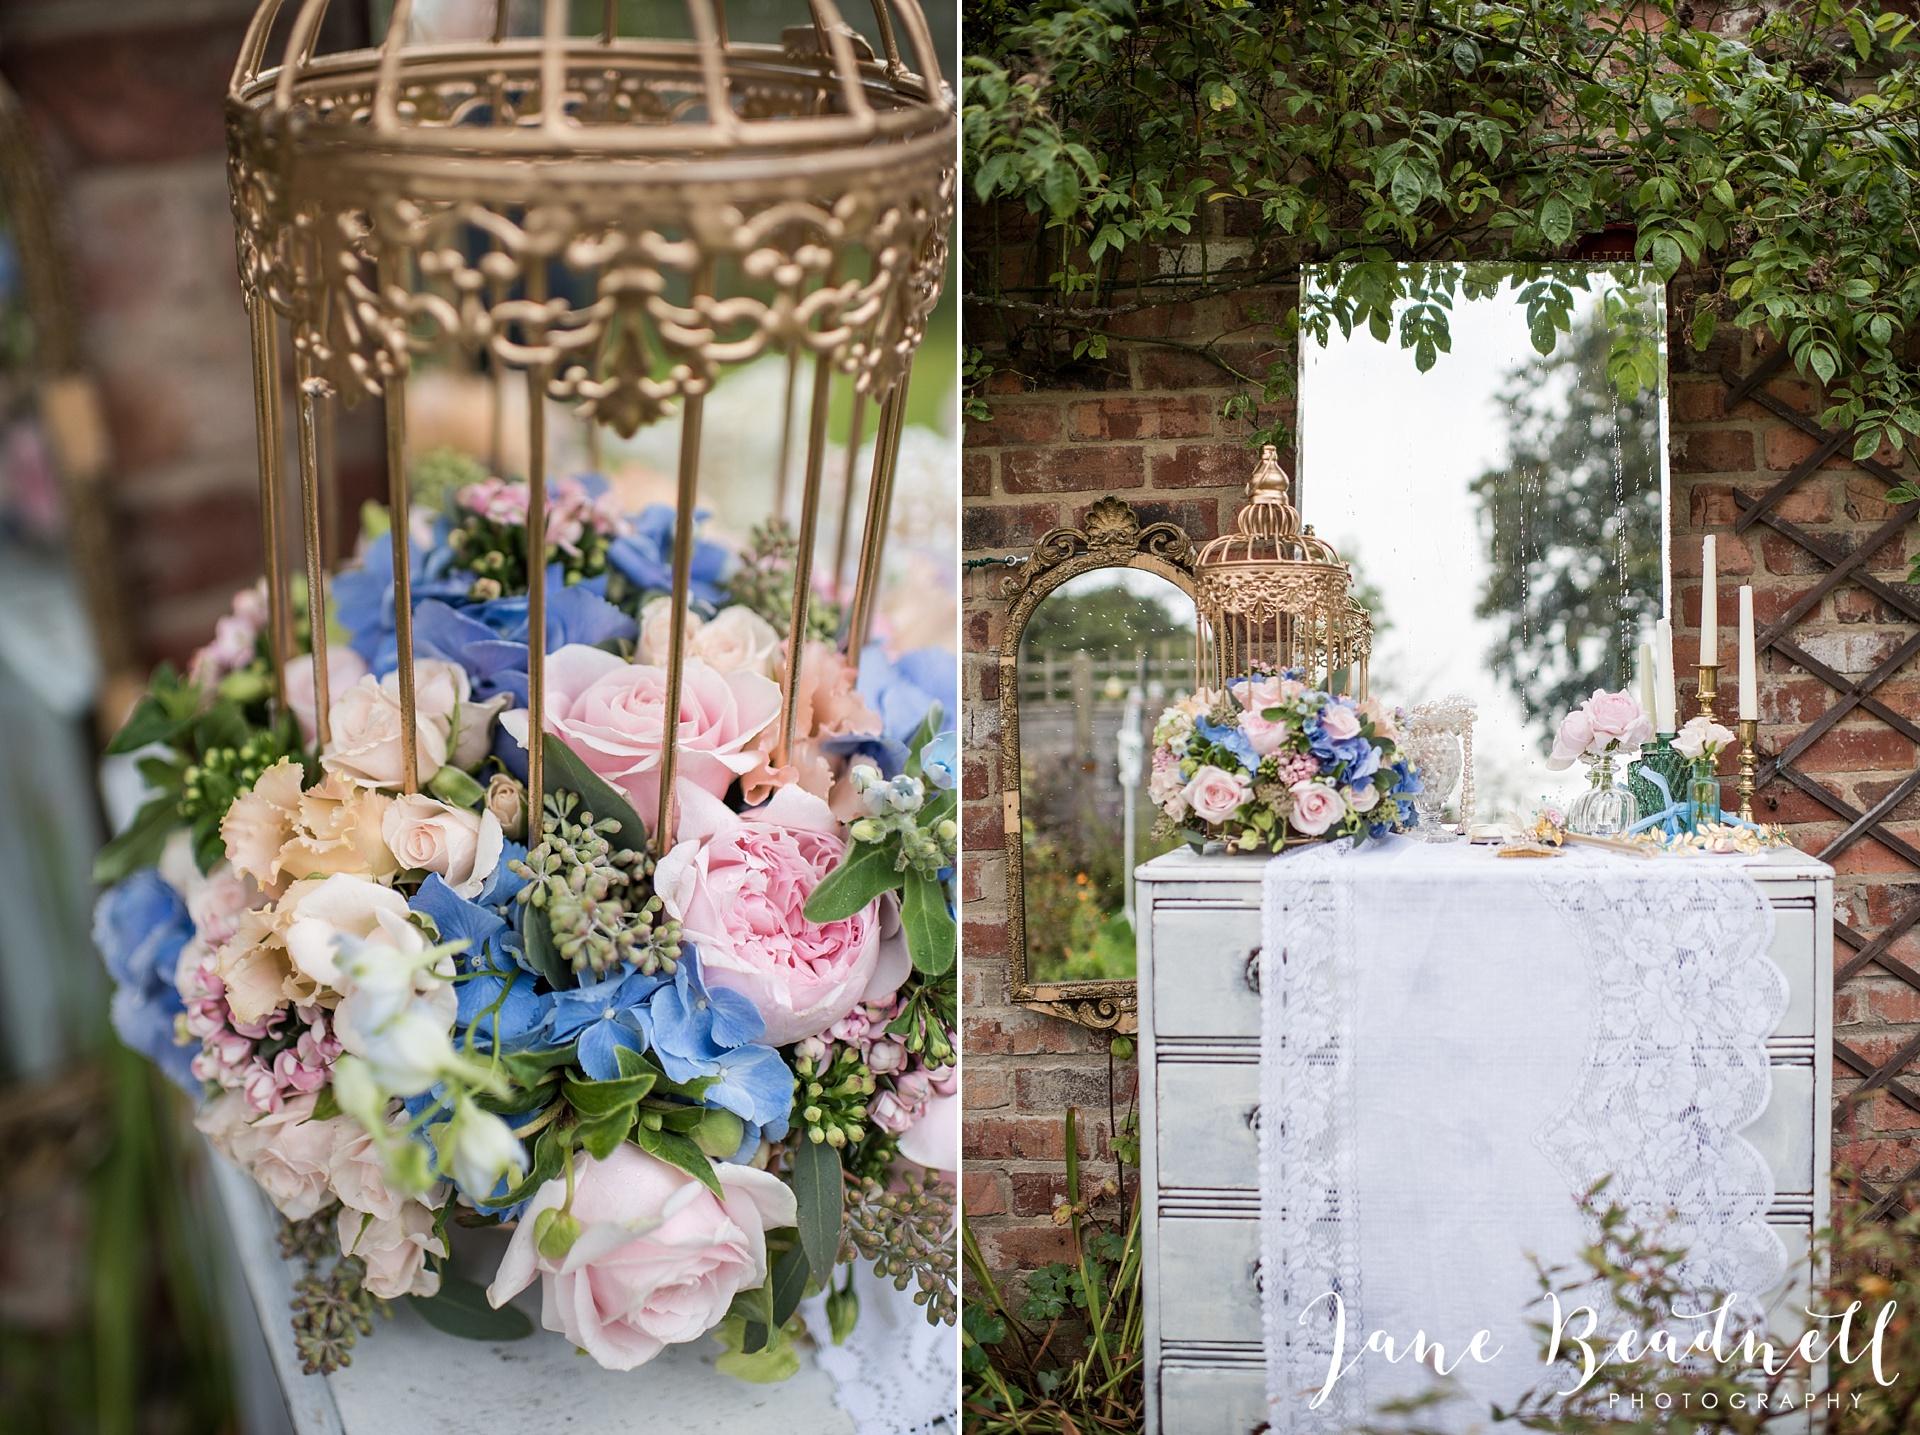 fine-art-wedding-photographer-jane-beadnell-photography-yorkshire-wedding-photographer_0007